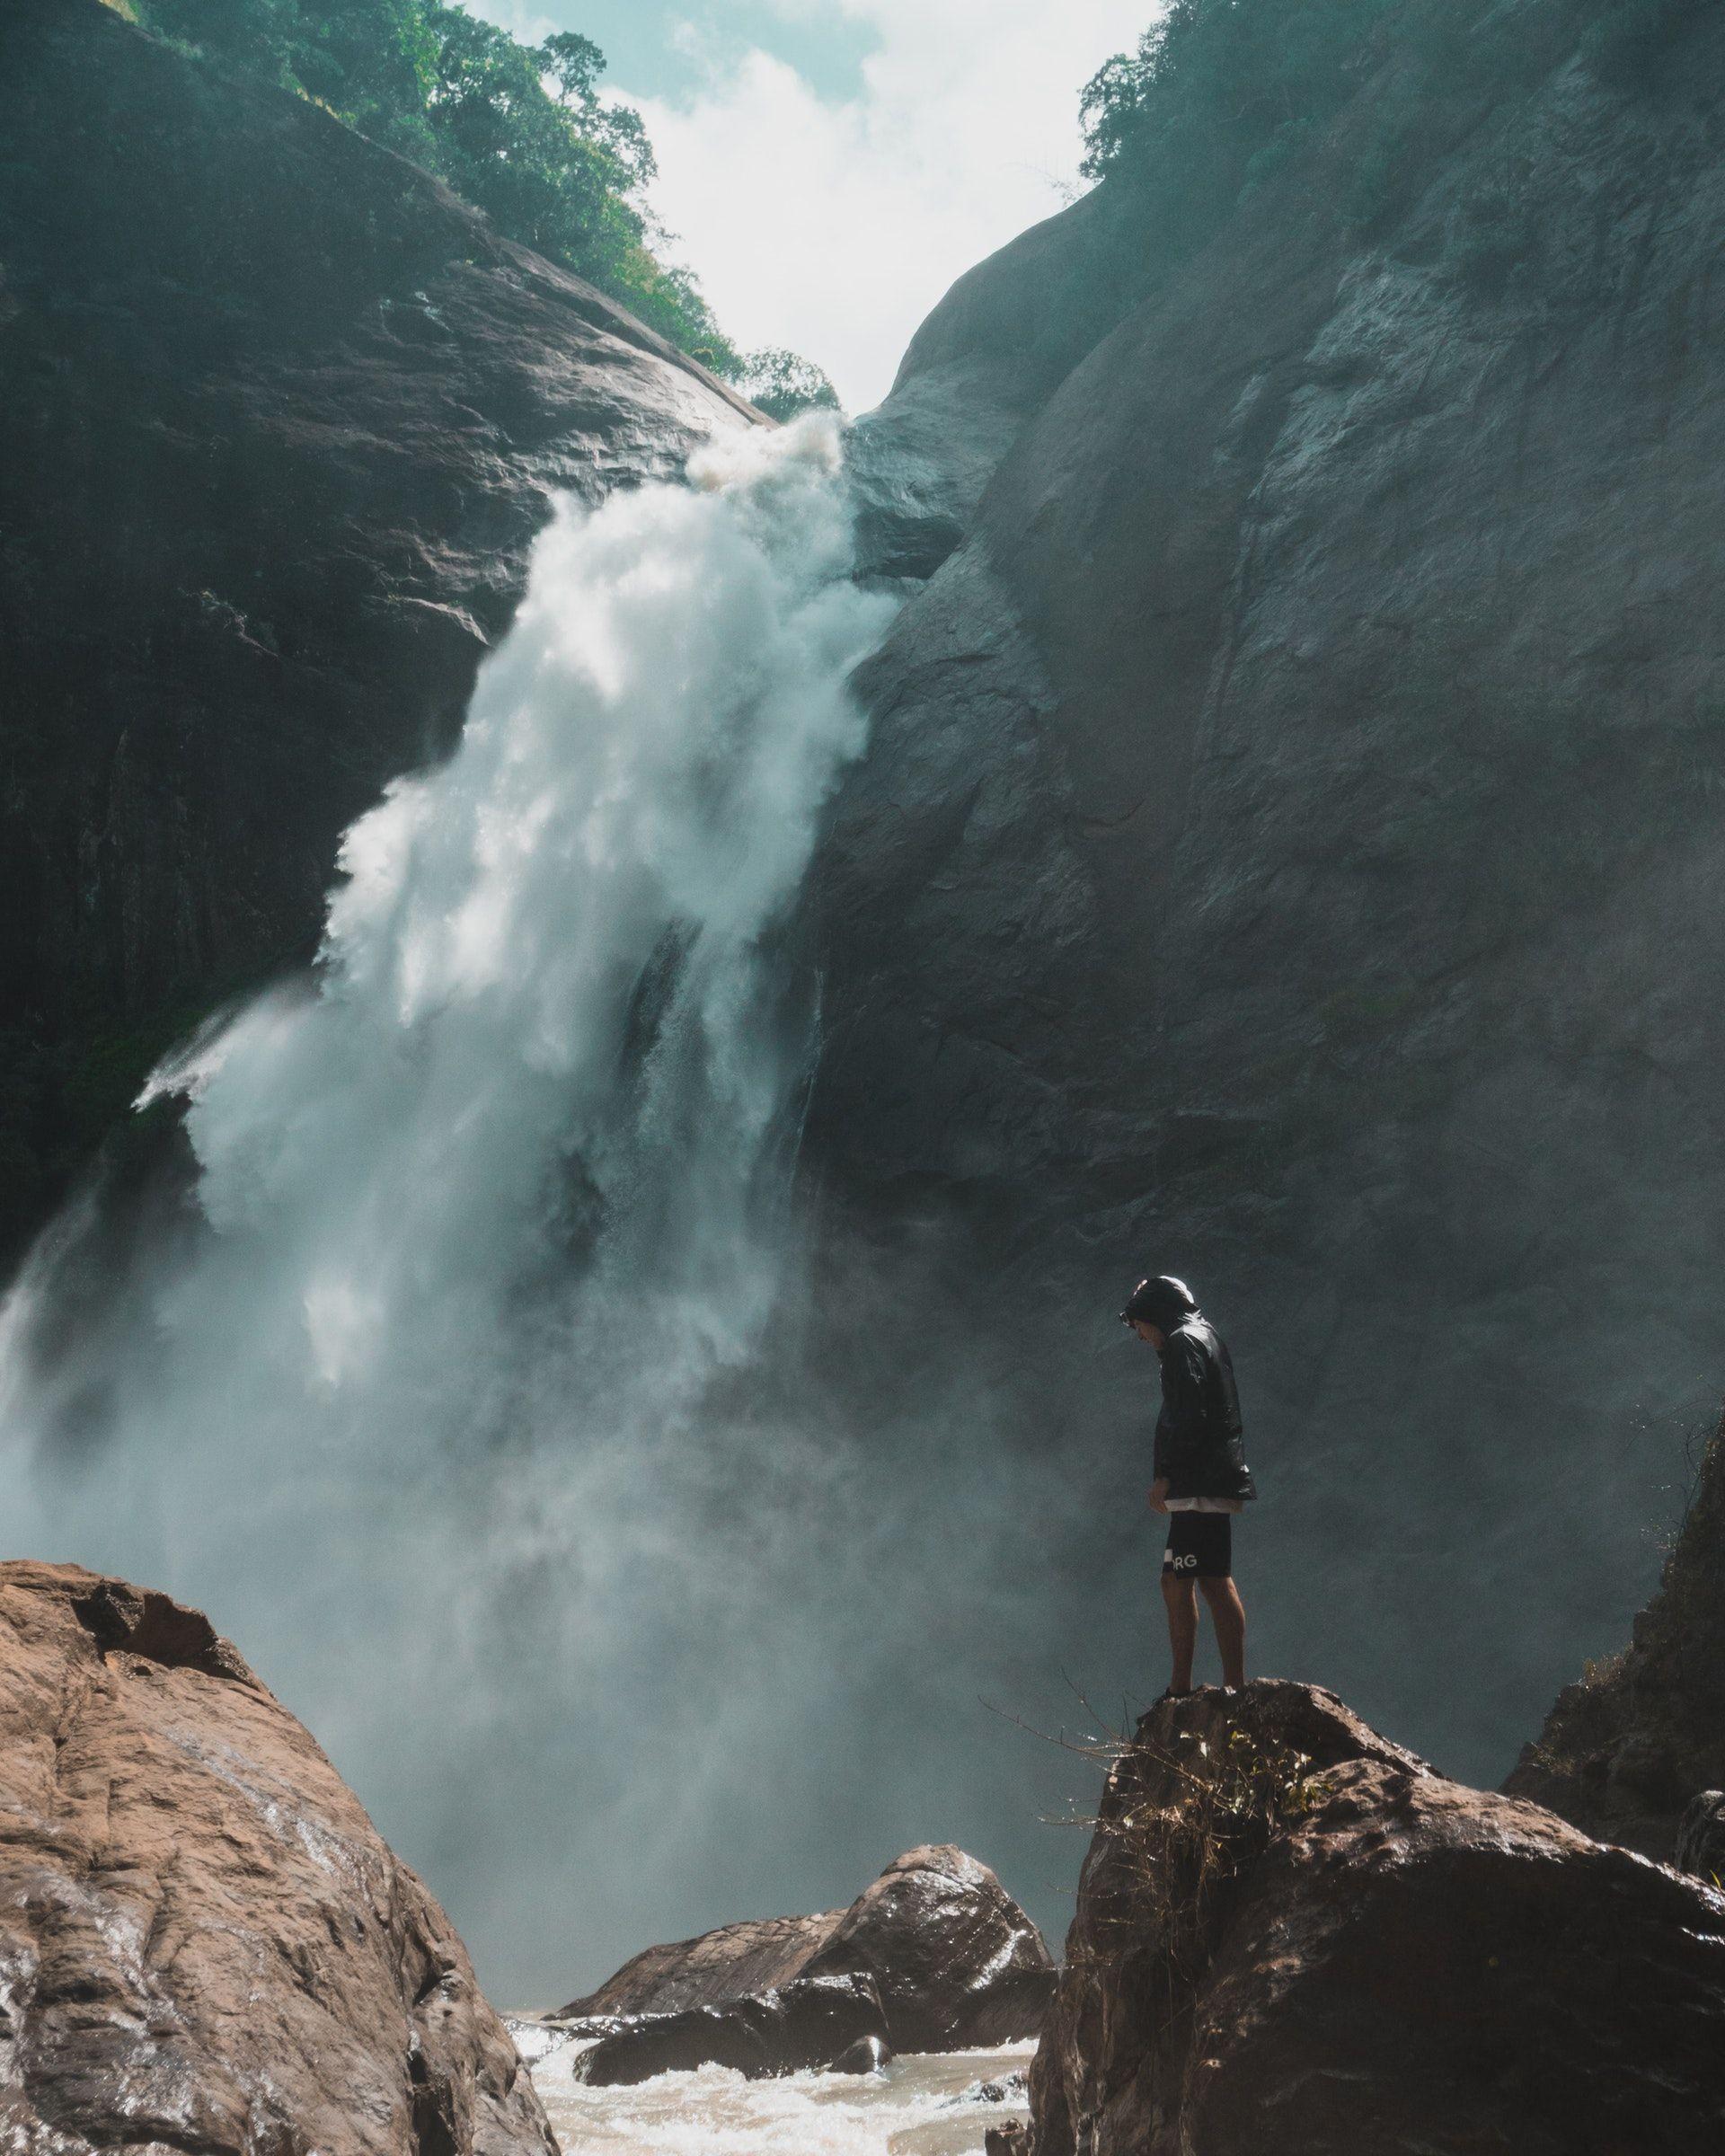 عکس زمینه مرد ایستاده کنار آبشار پس زمینه